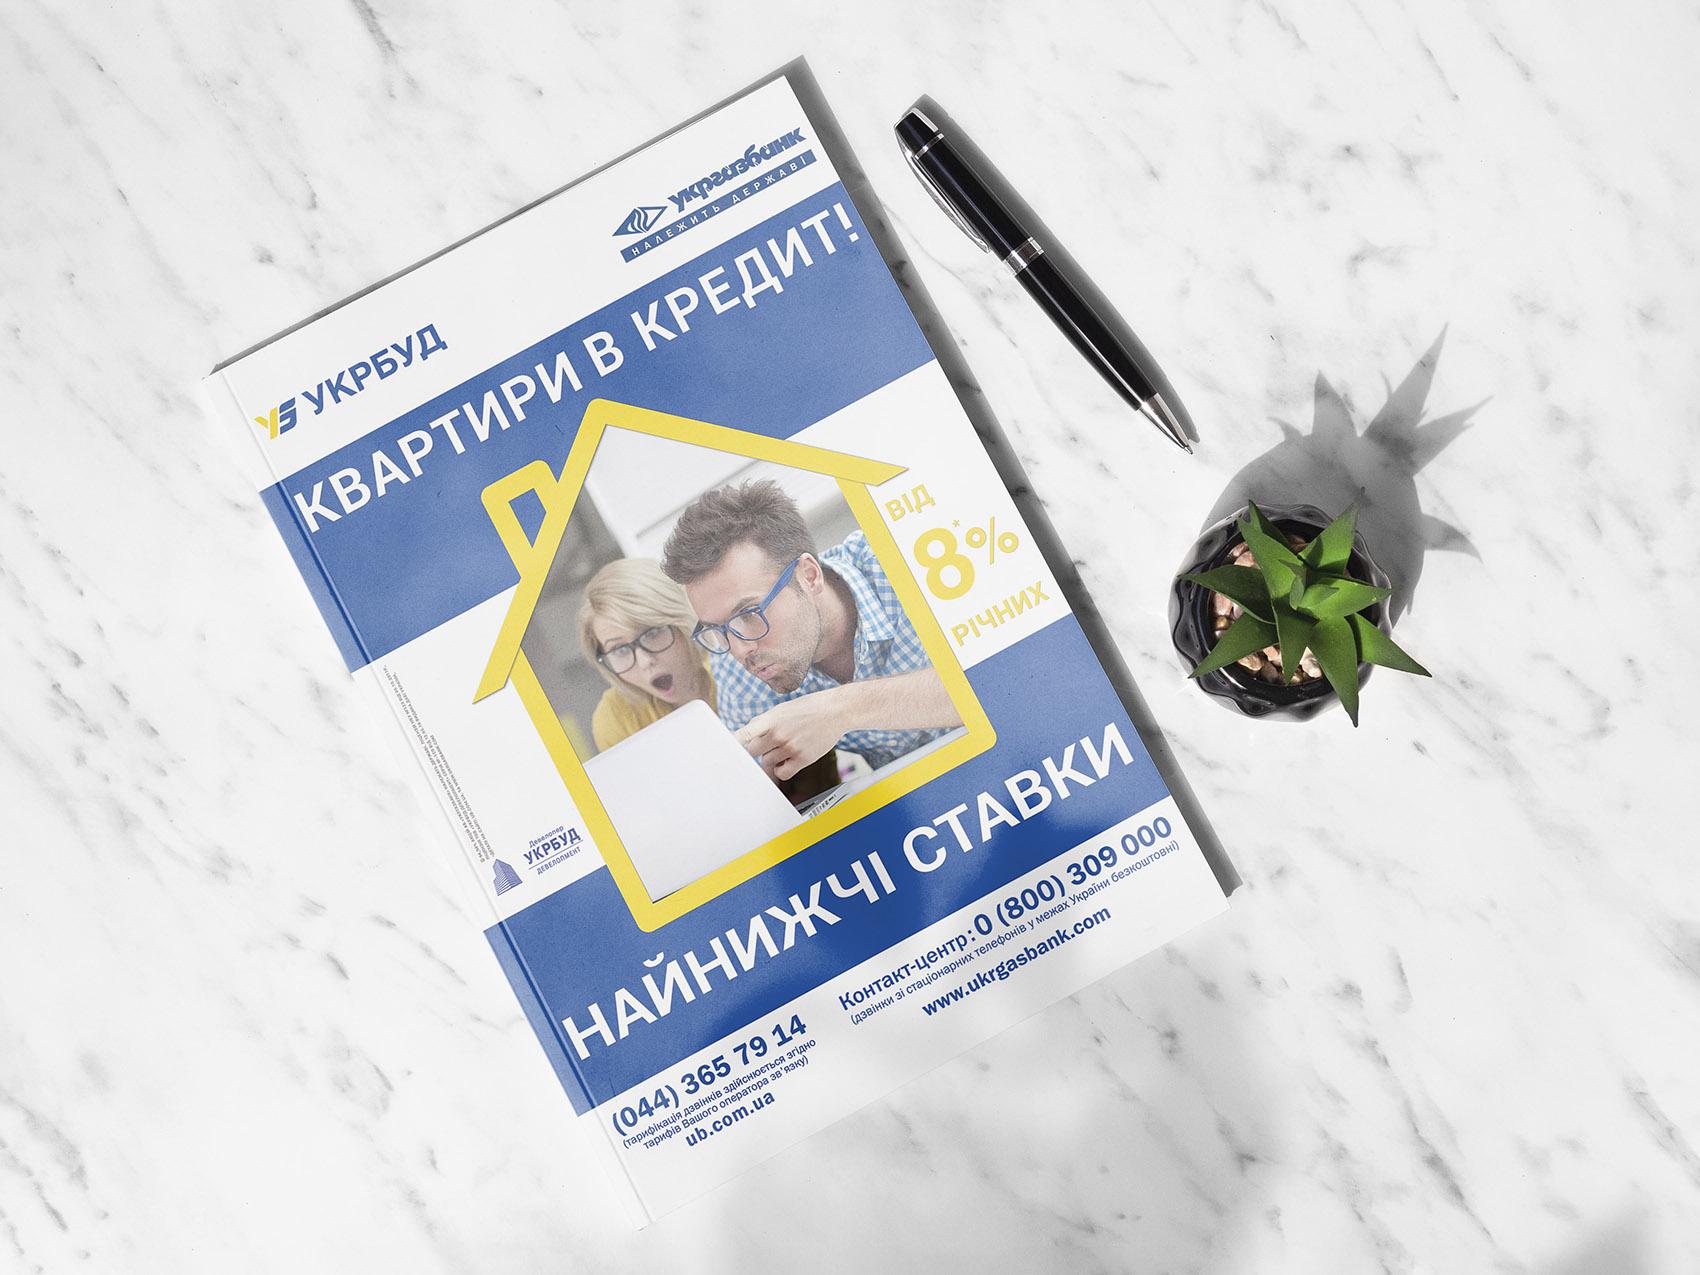 corporate designs artkatana kateryna fedorova заказать буклет екатерина федорова дизайнер